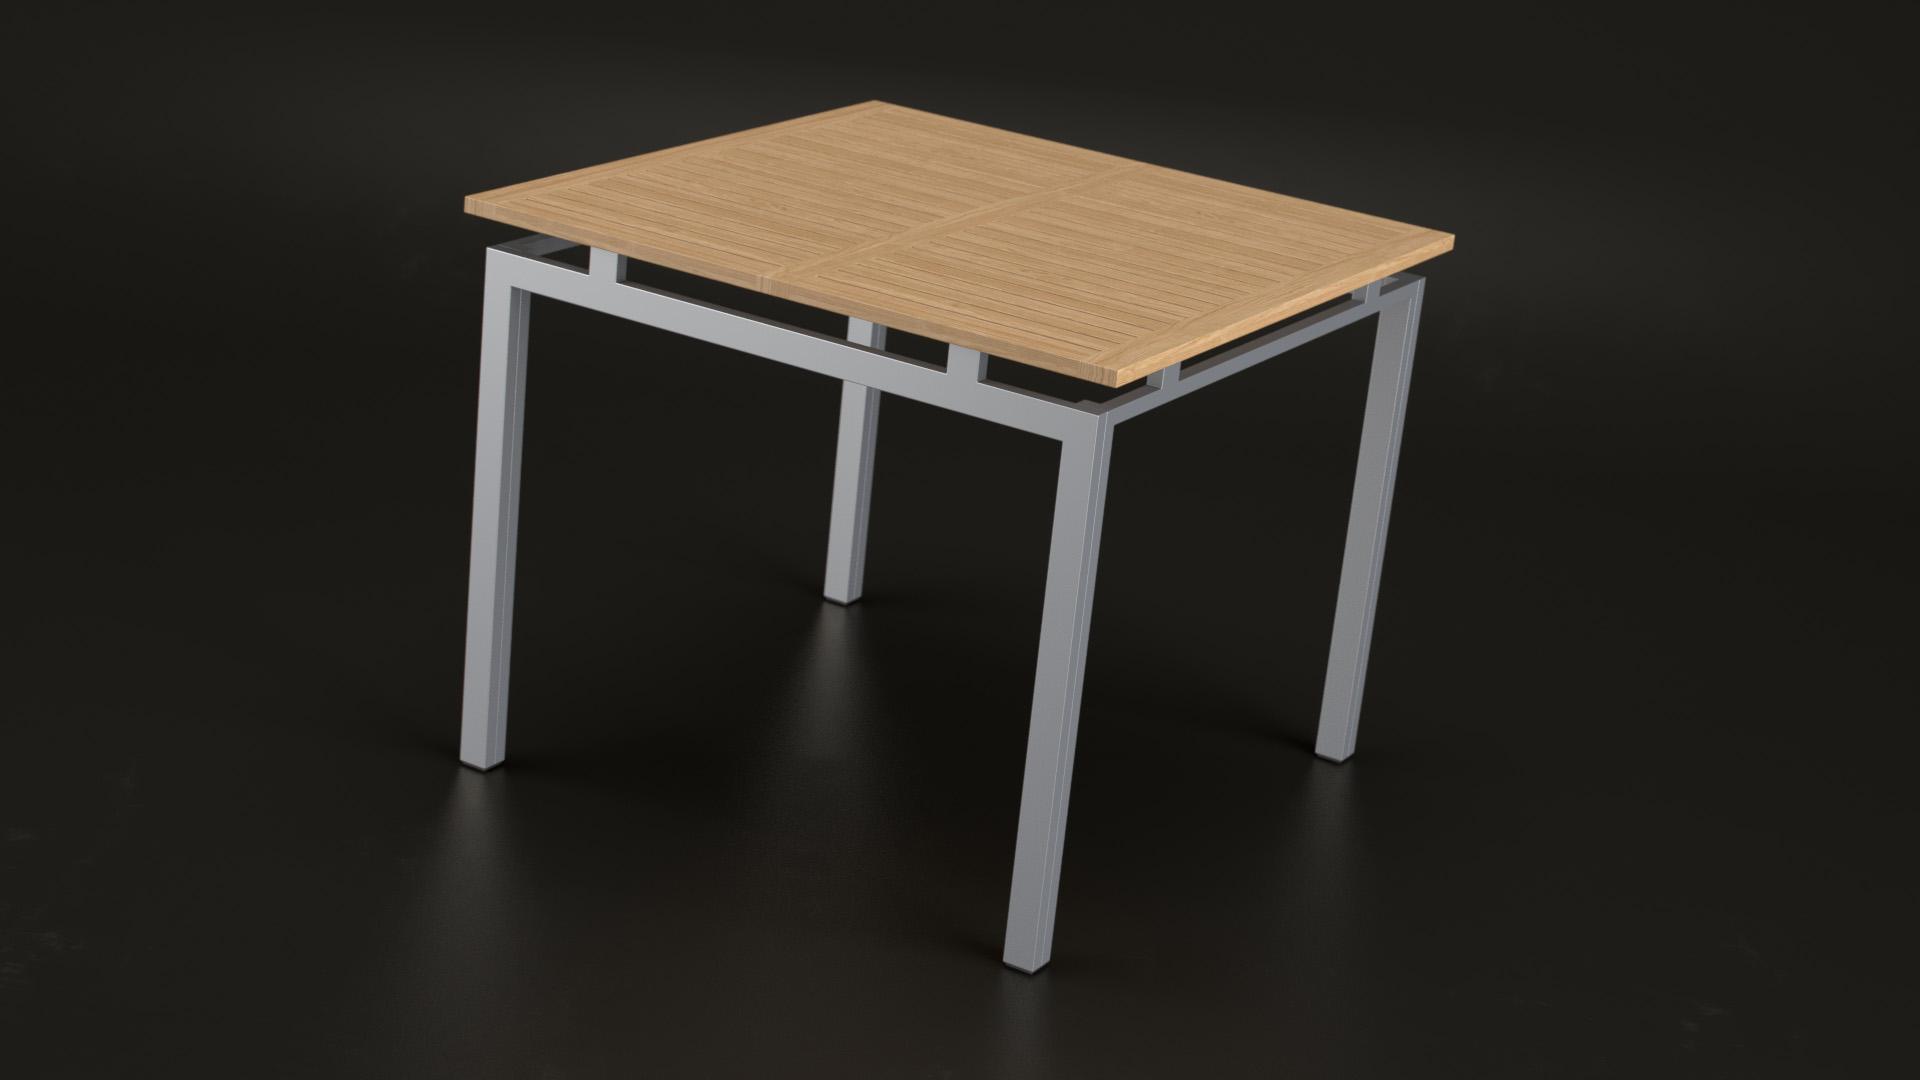 Alu_WoodGarden_Table_BlackSet_01_V1.01_0003